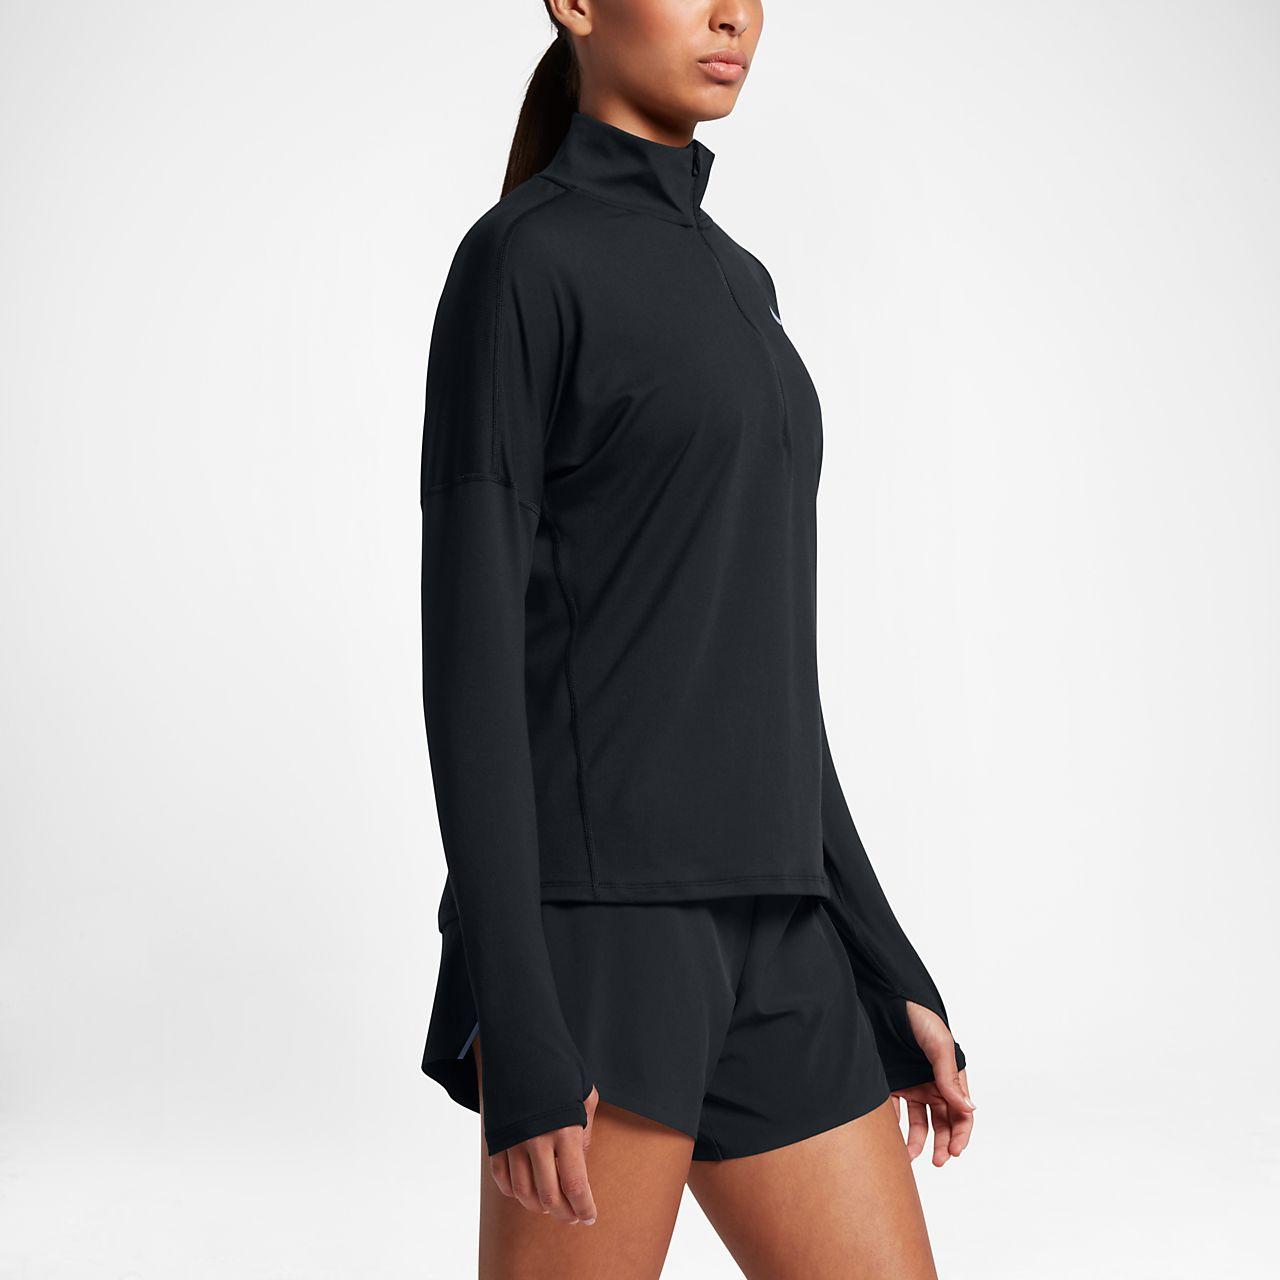 7a75b68789da Nike Dri-FIT Women s Long-Sleeve Running Half-Zip Top. Nike.com AU